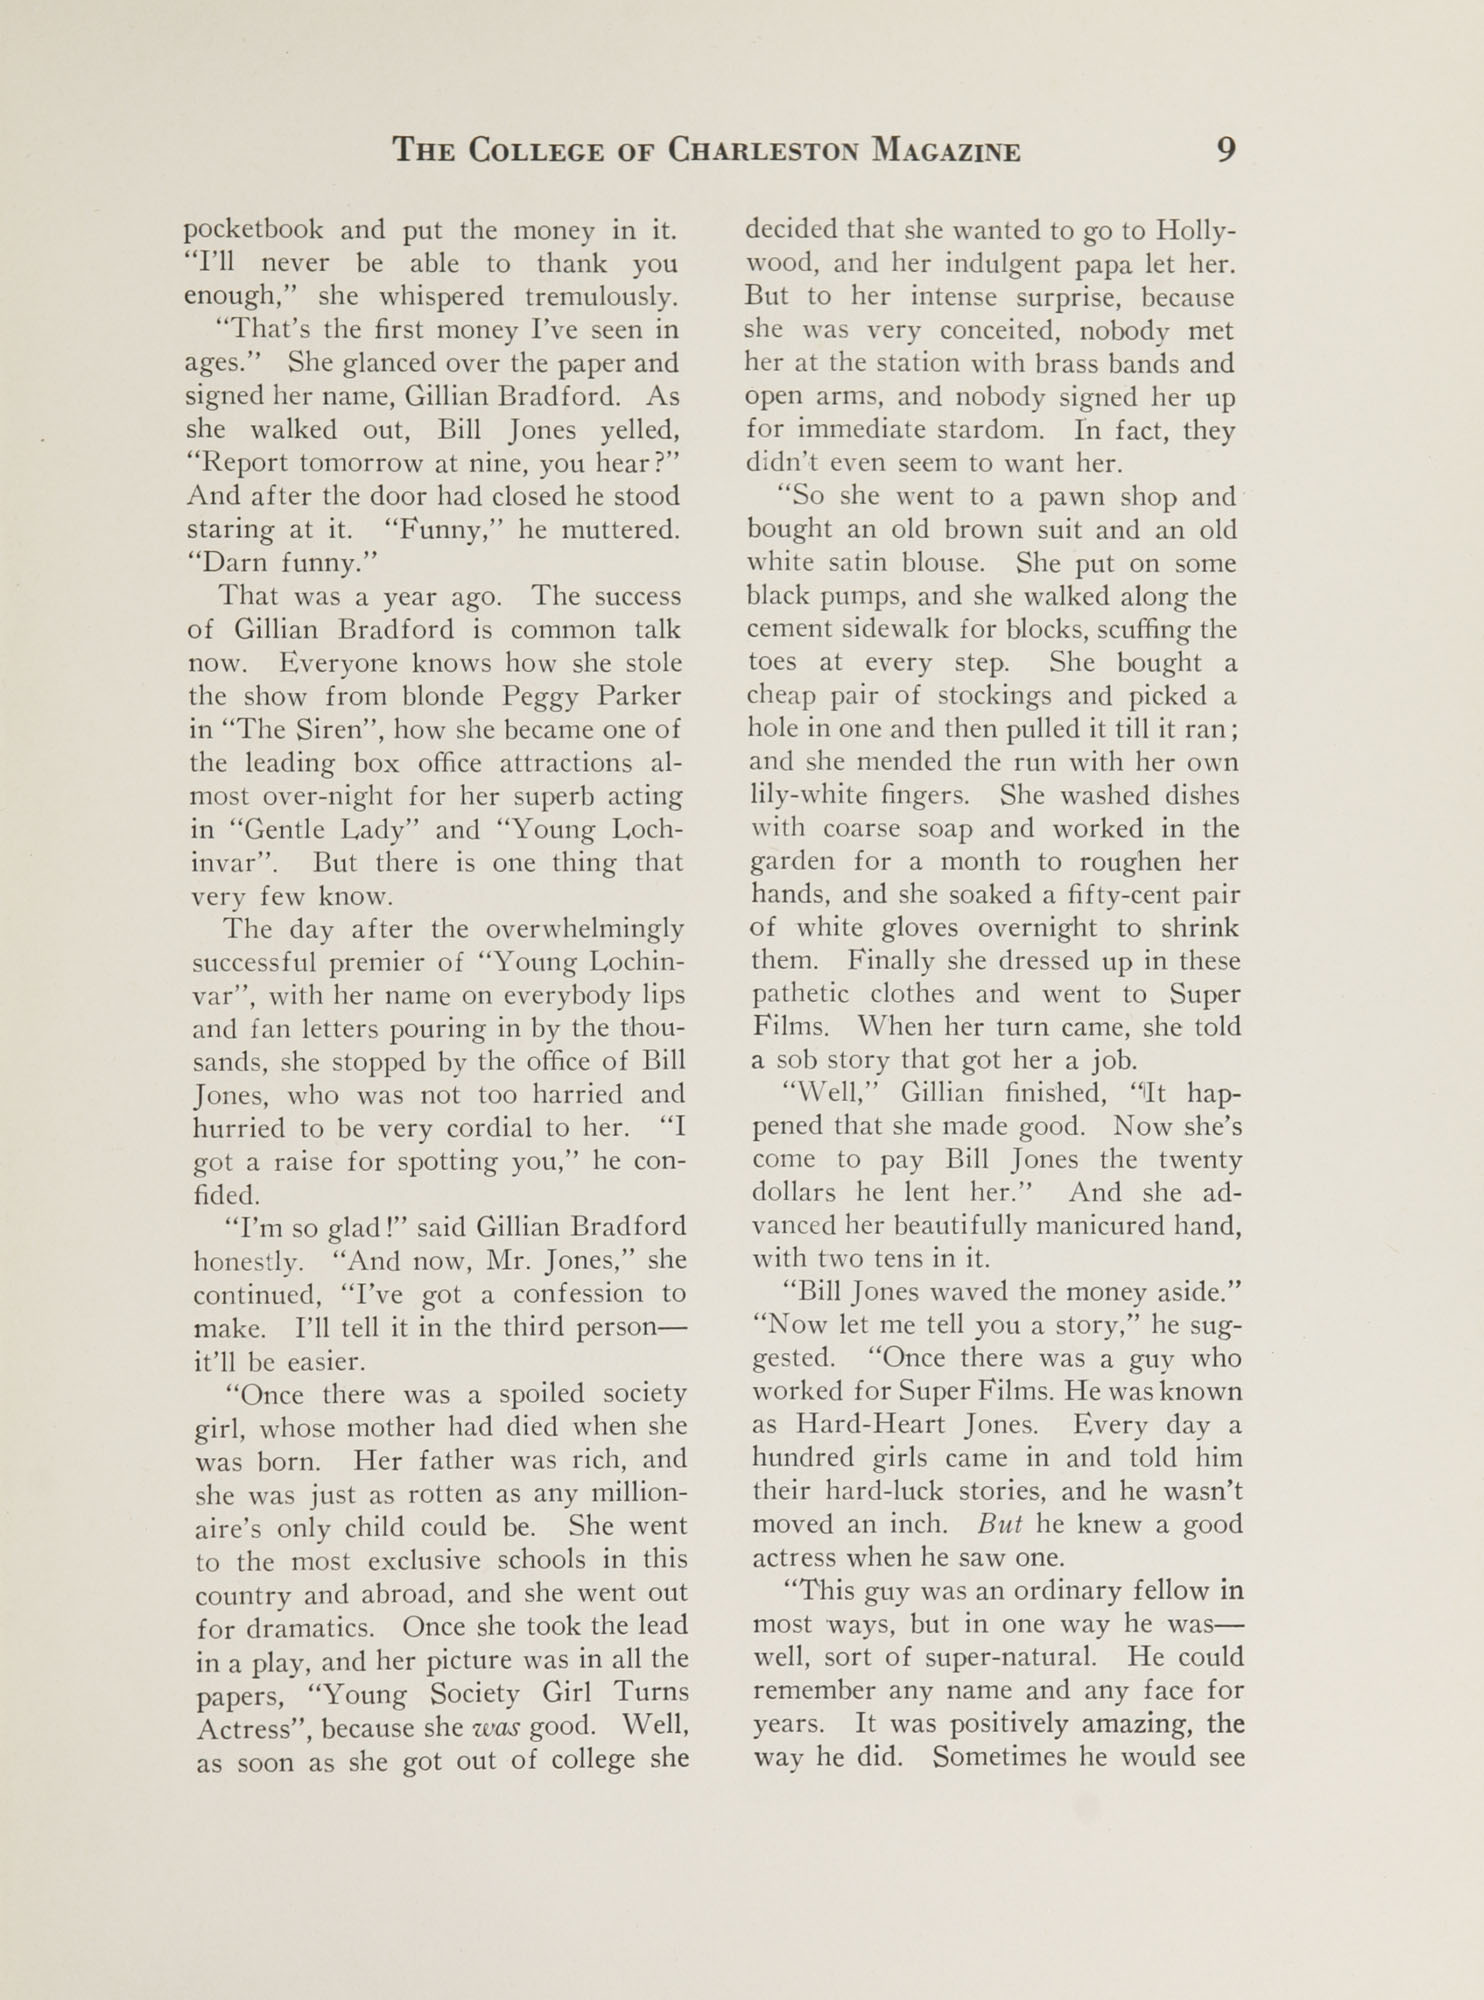 College of Charleston Magazine, 1937-1938, Vol. XXXXI No. 1, page 9